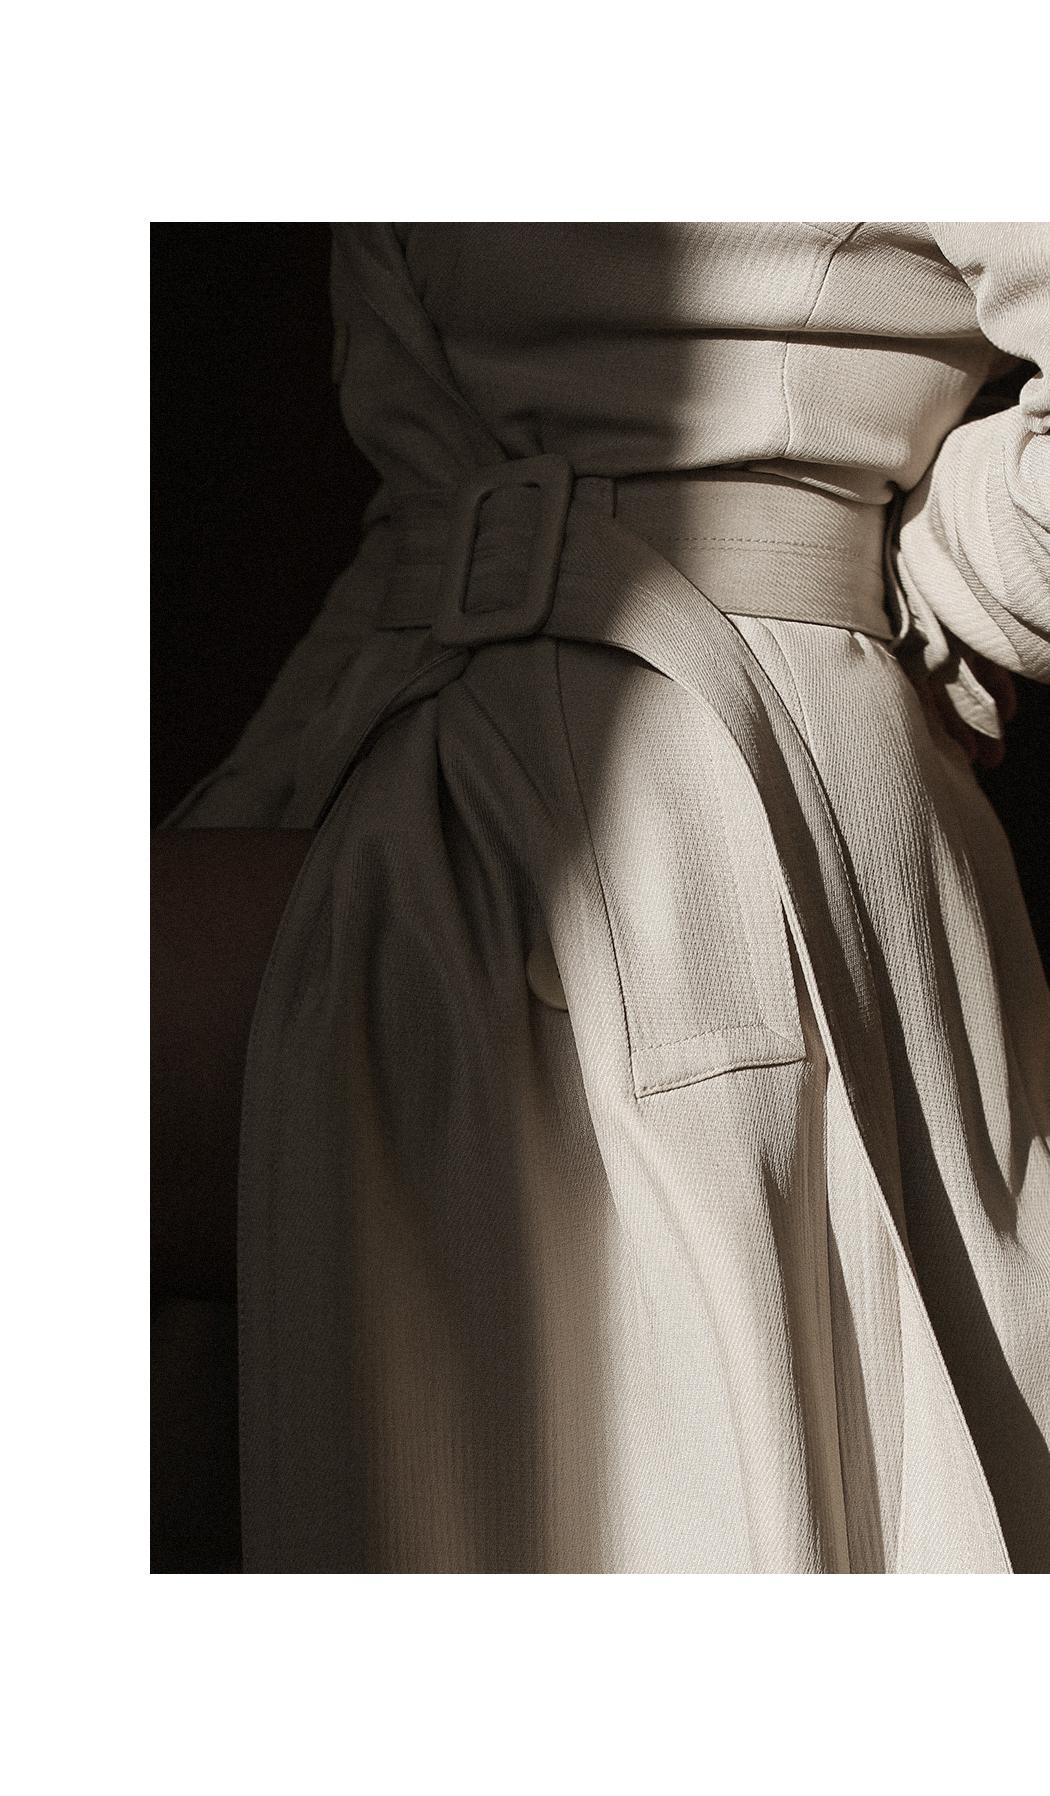 Editorial: Fiona Dinkelbach wears a Ivy & Oak Trenchcoat